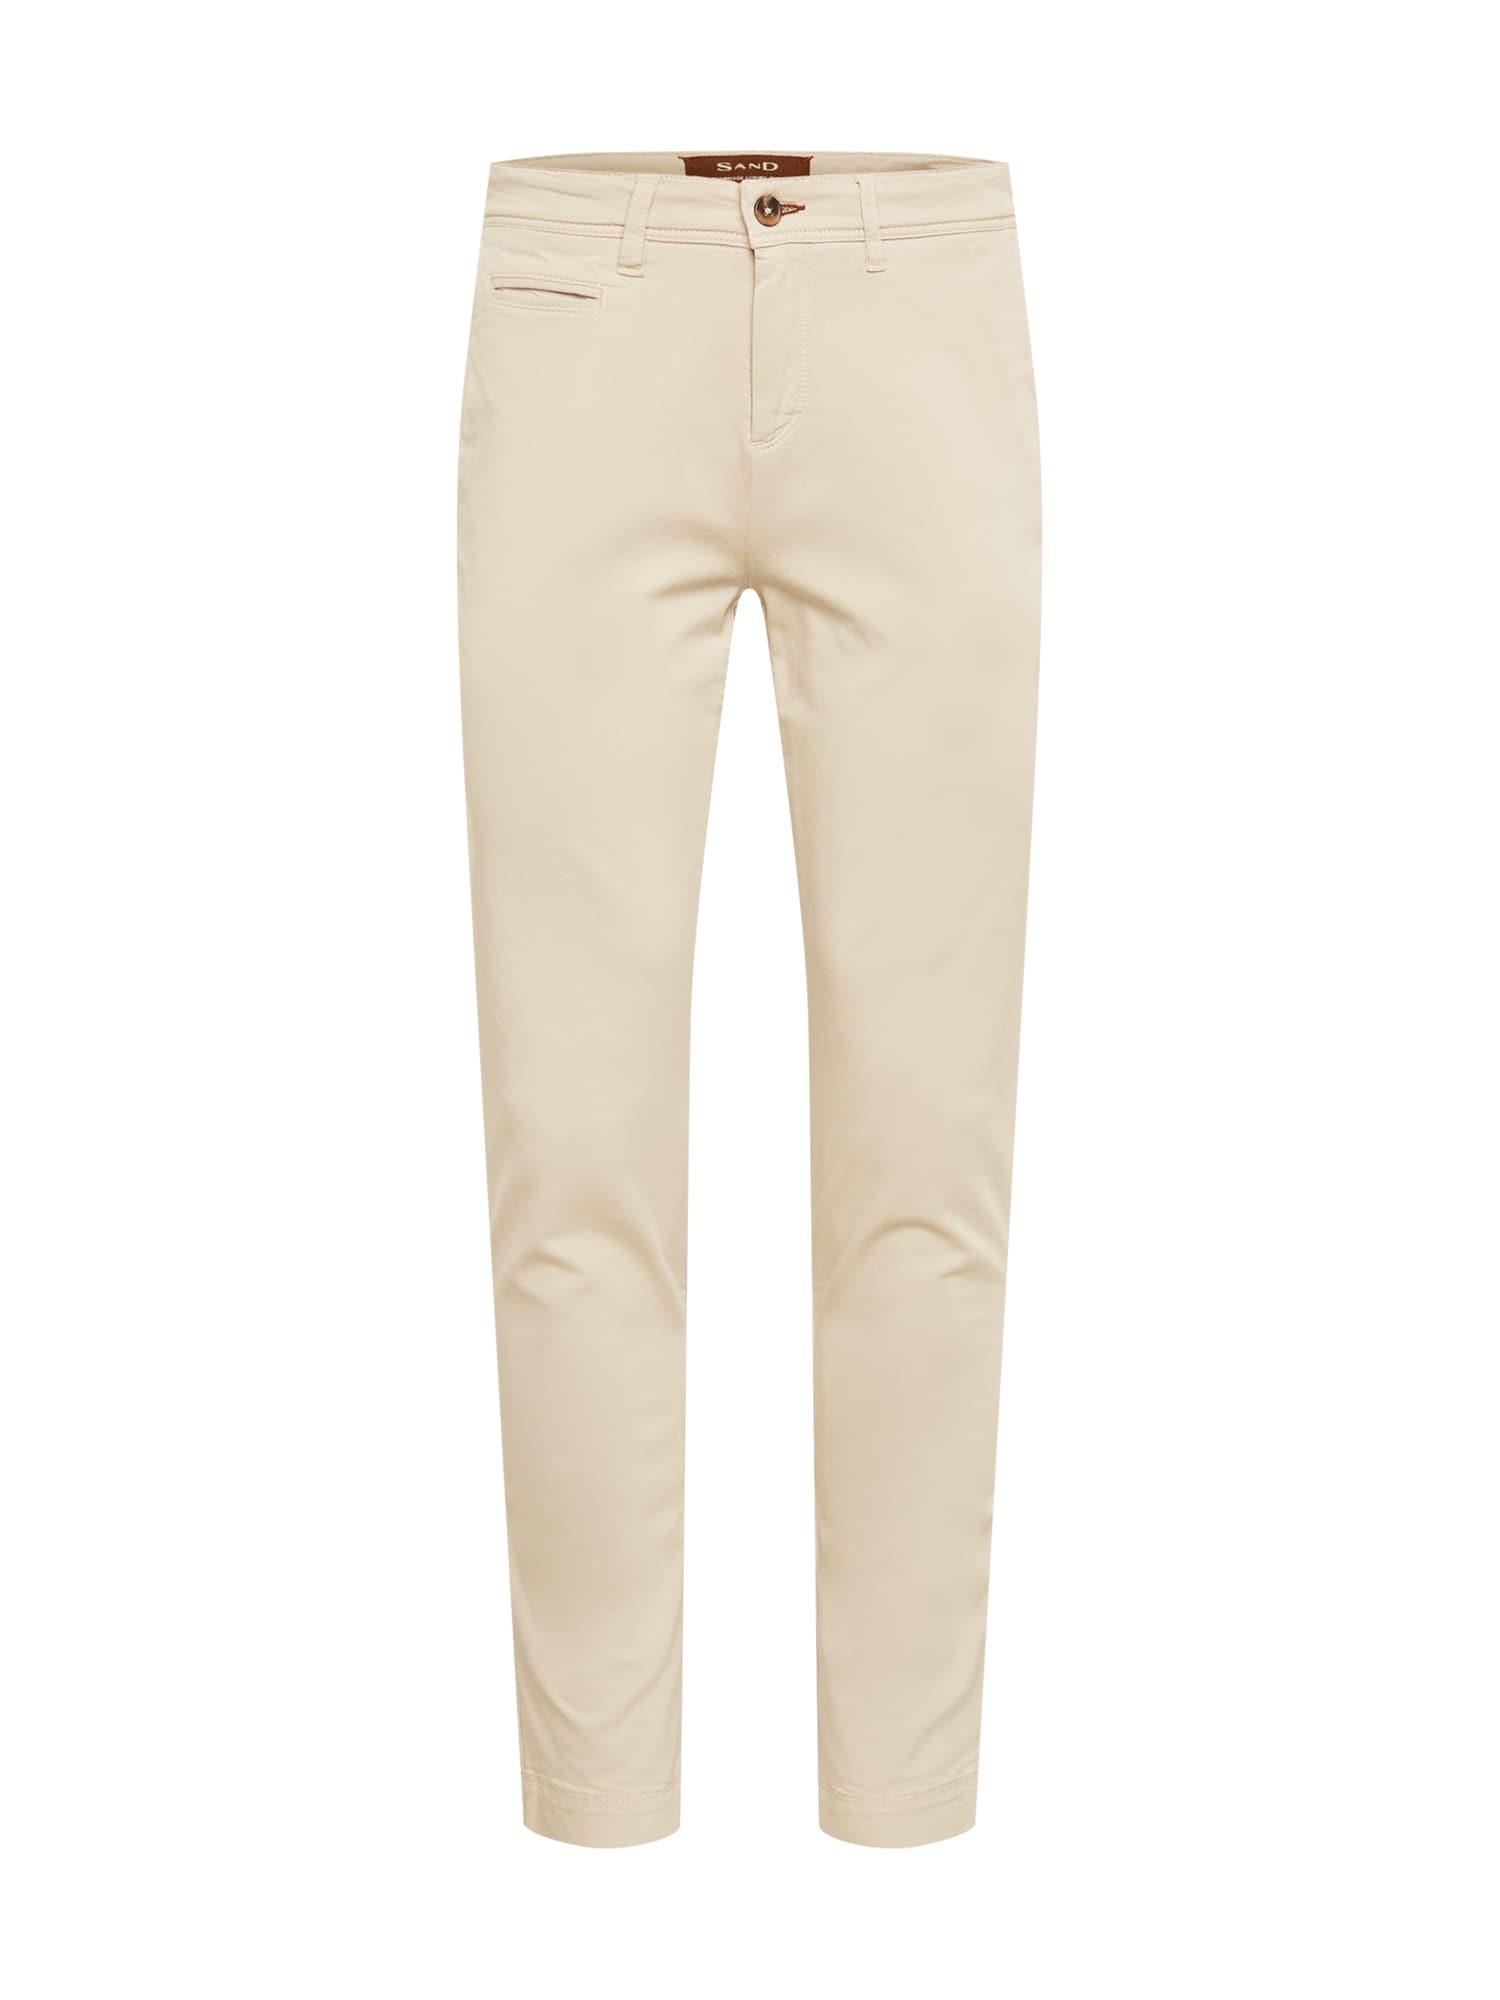 "SAND COPENHAGEN ""Chino"" stiliaus kelnės"